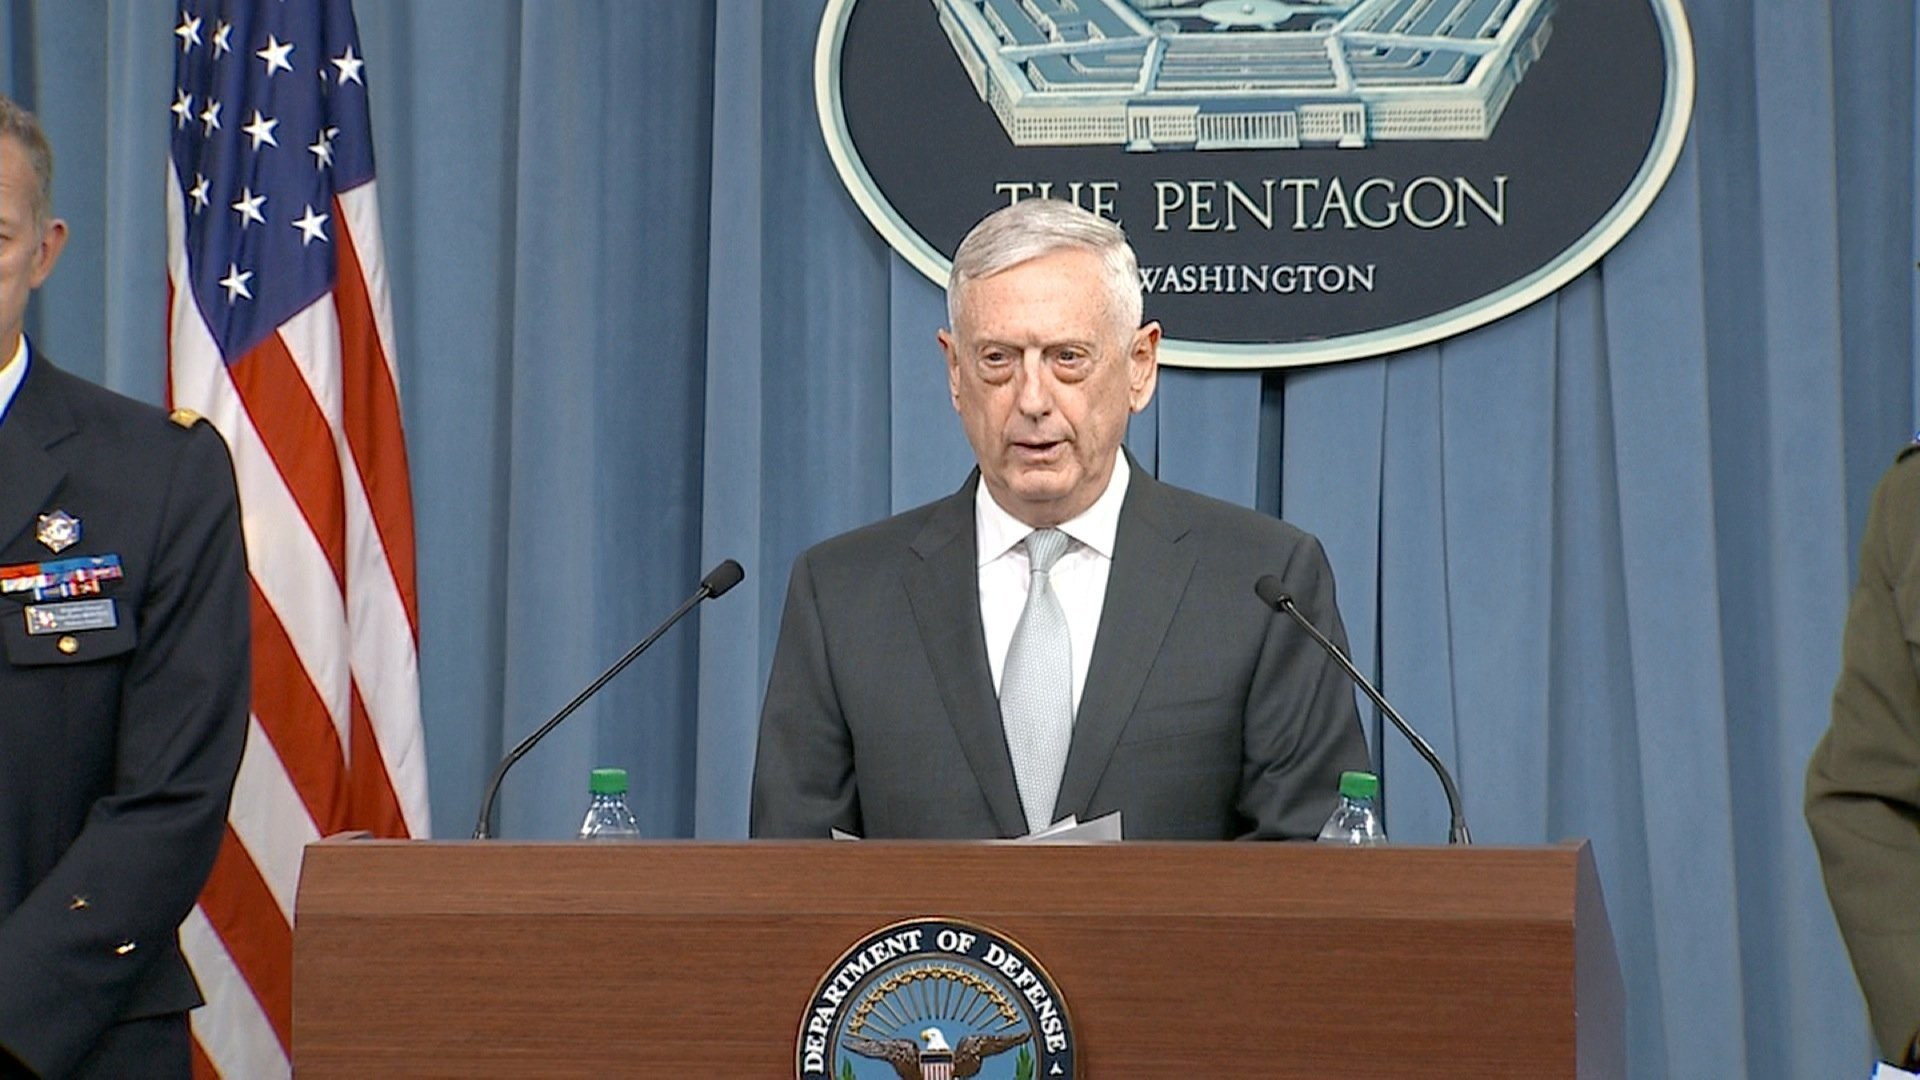 Defense Secretary James Mattis speaks during a Pentagon briefing after President Trump announced U.S. strikes on Syria.